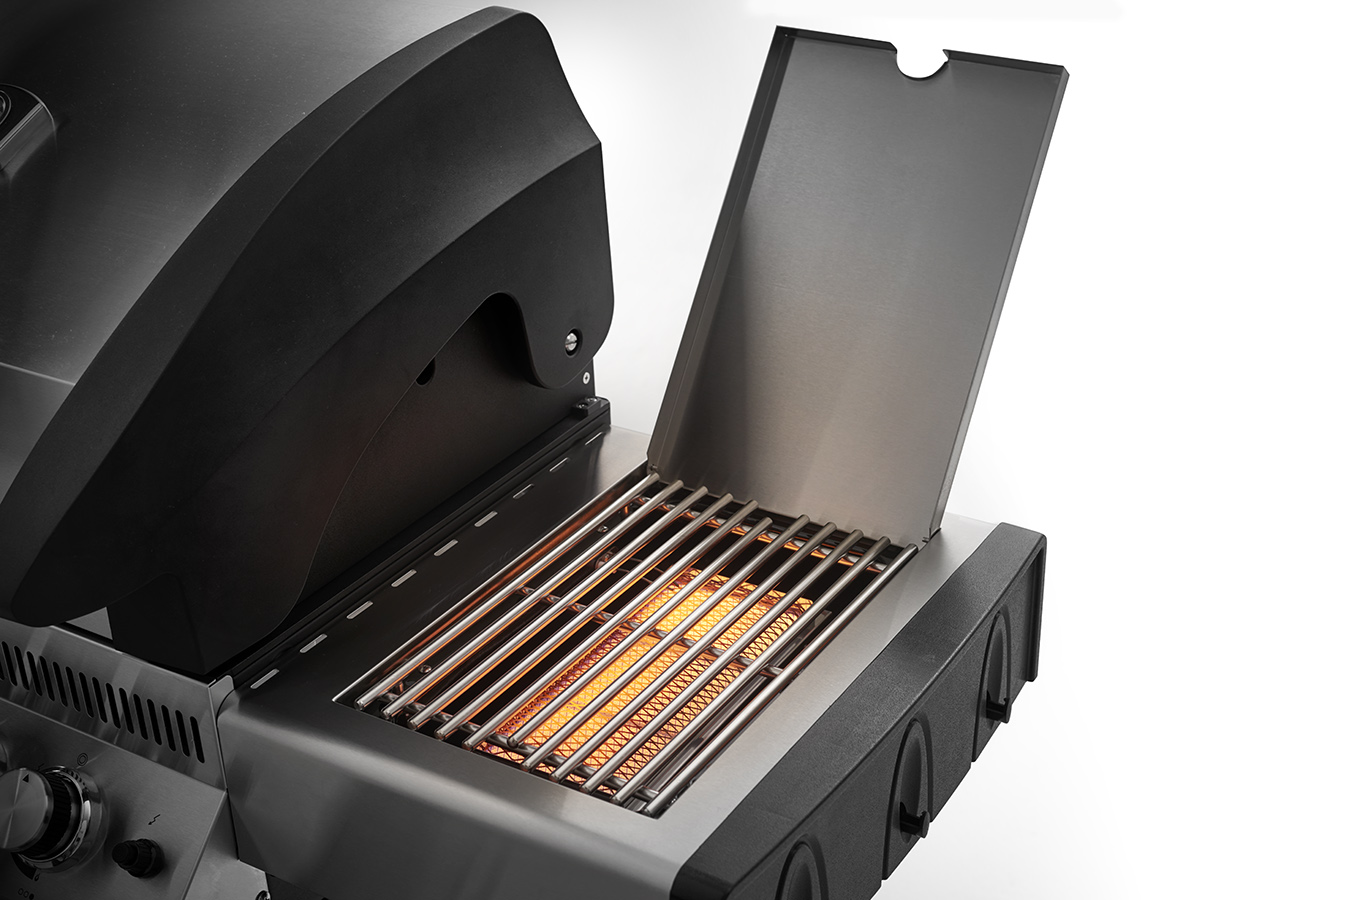 Pulled Pork Gasgrill Xenia : Rösle gasgrill räuchern grilltipp räuchern im gasgrill weitere